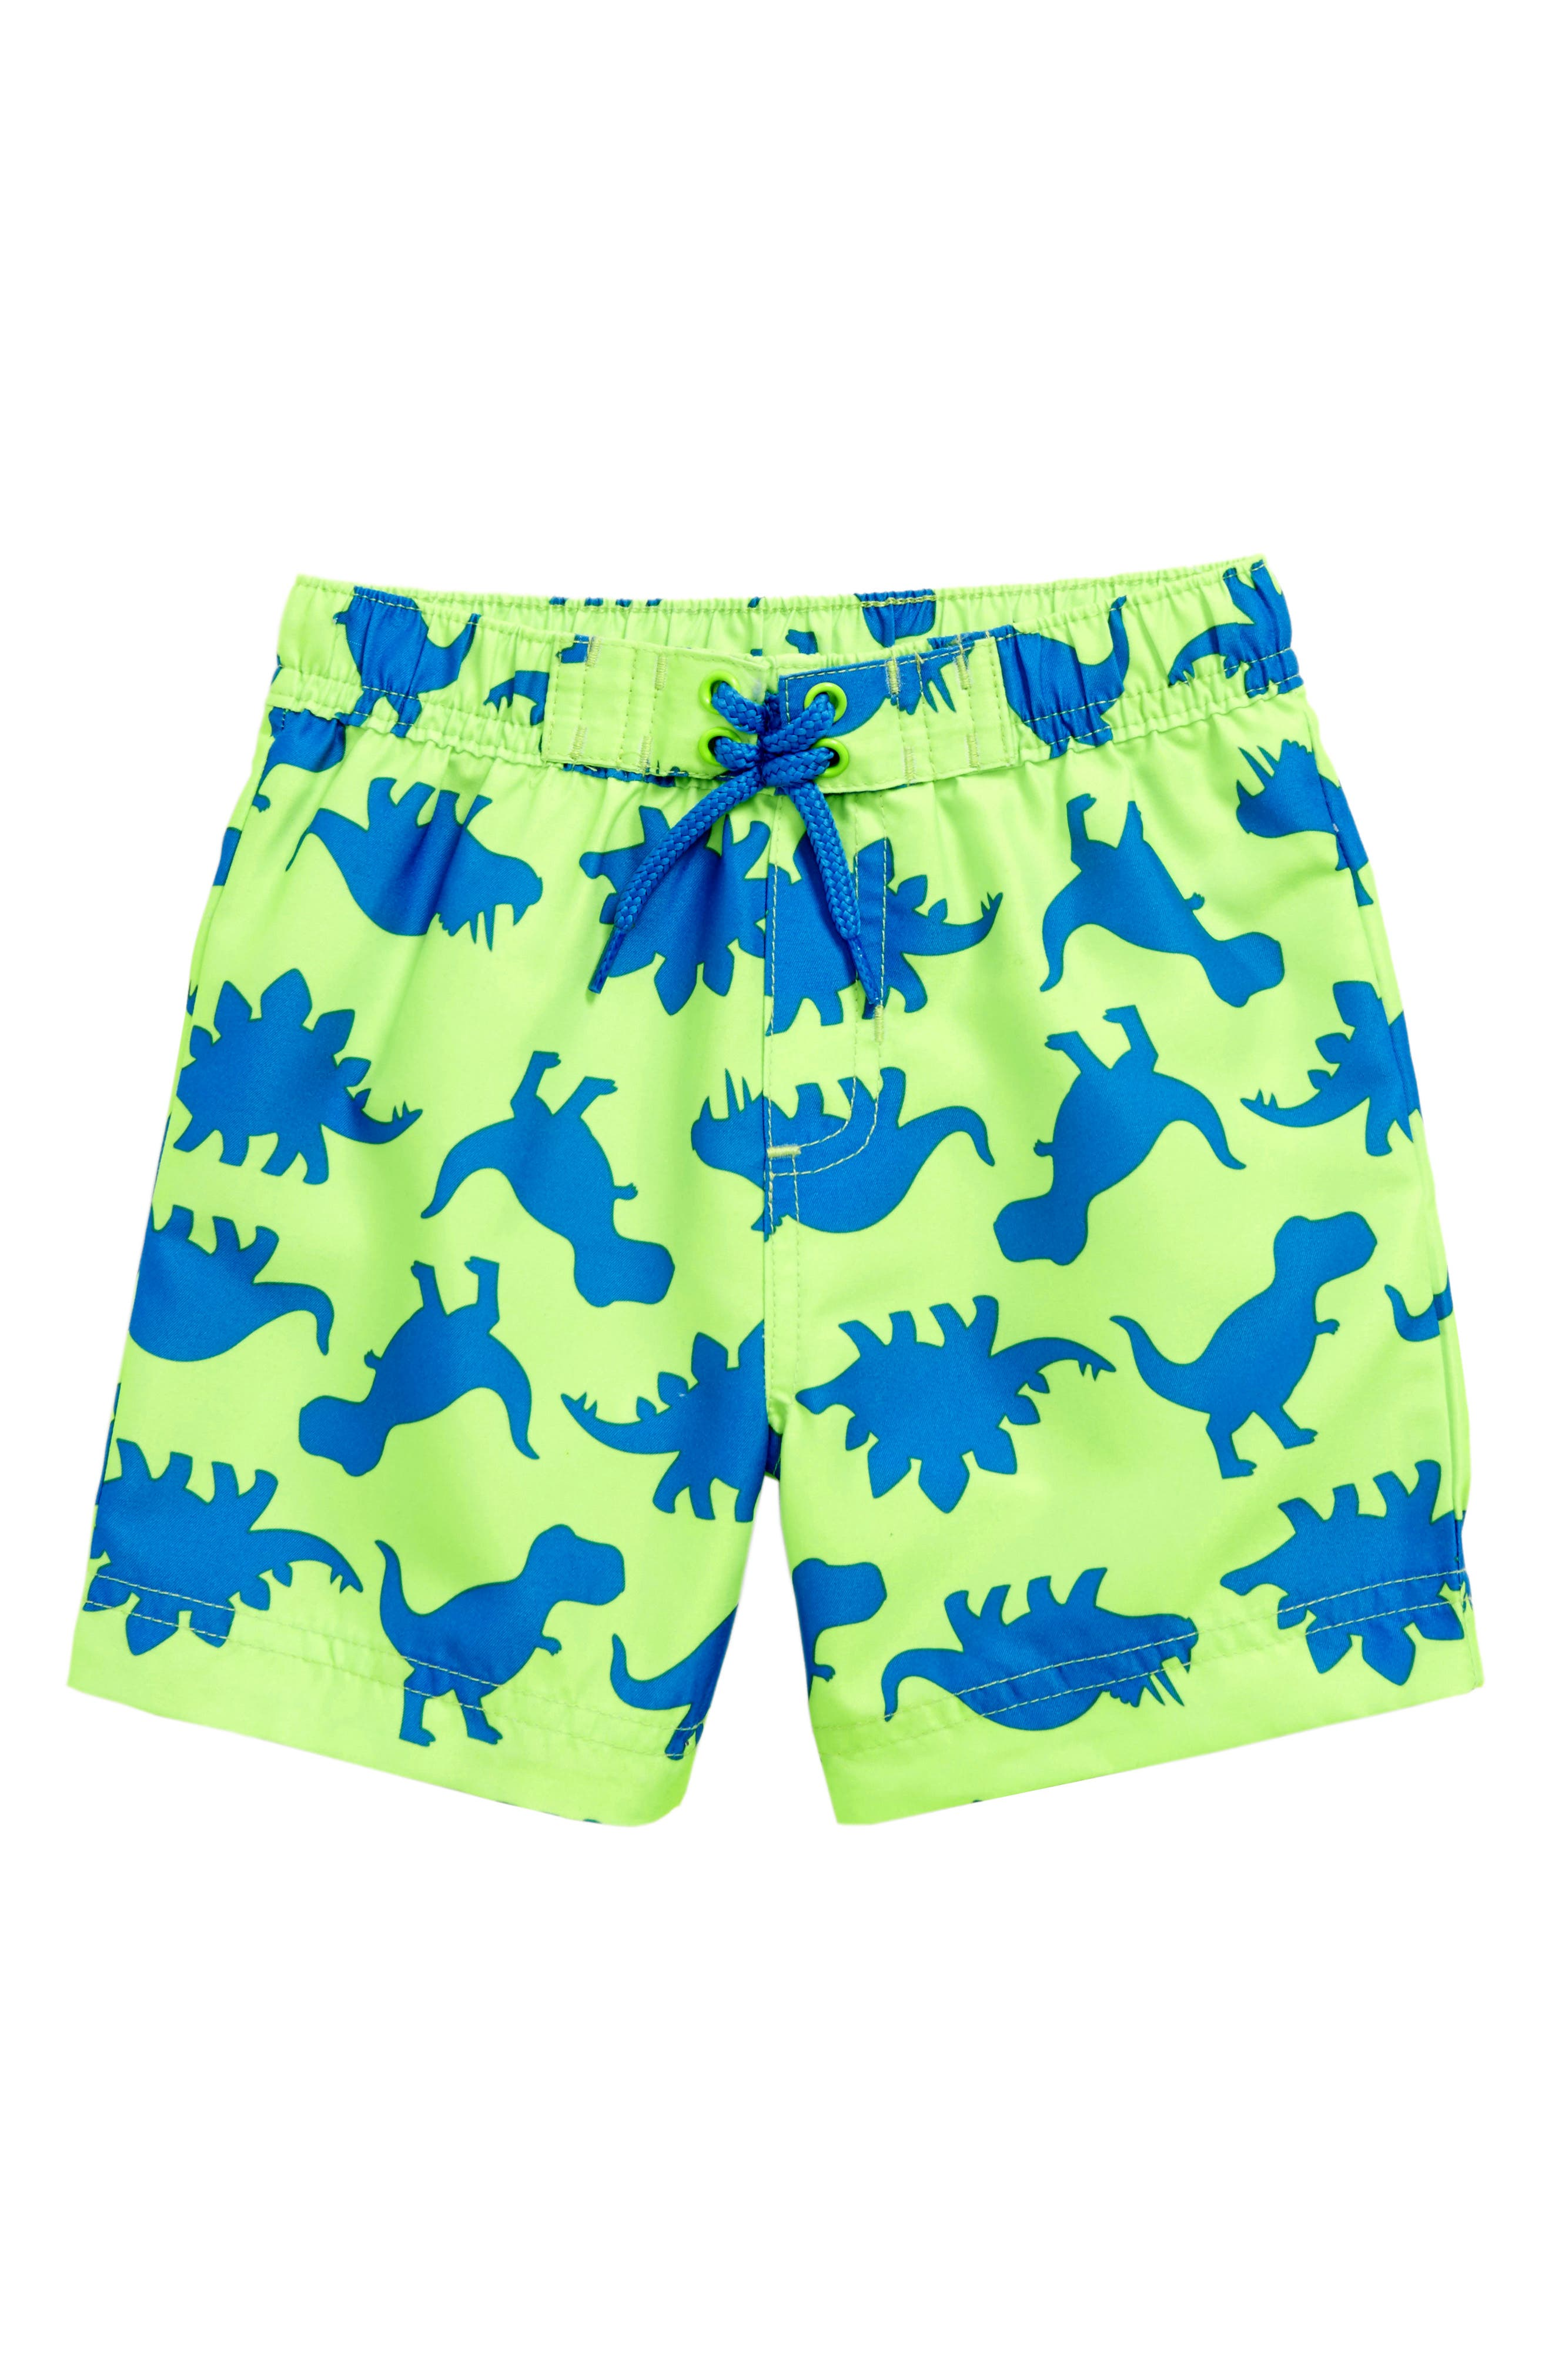 Dino UPF 50+ Swim Trunks,                             Main thumbnail 1, color,                             Green Multi